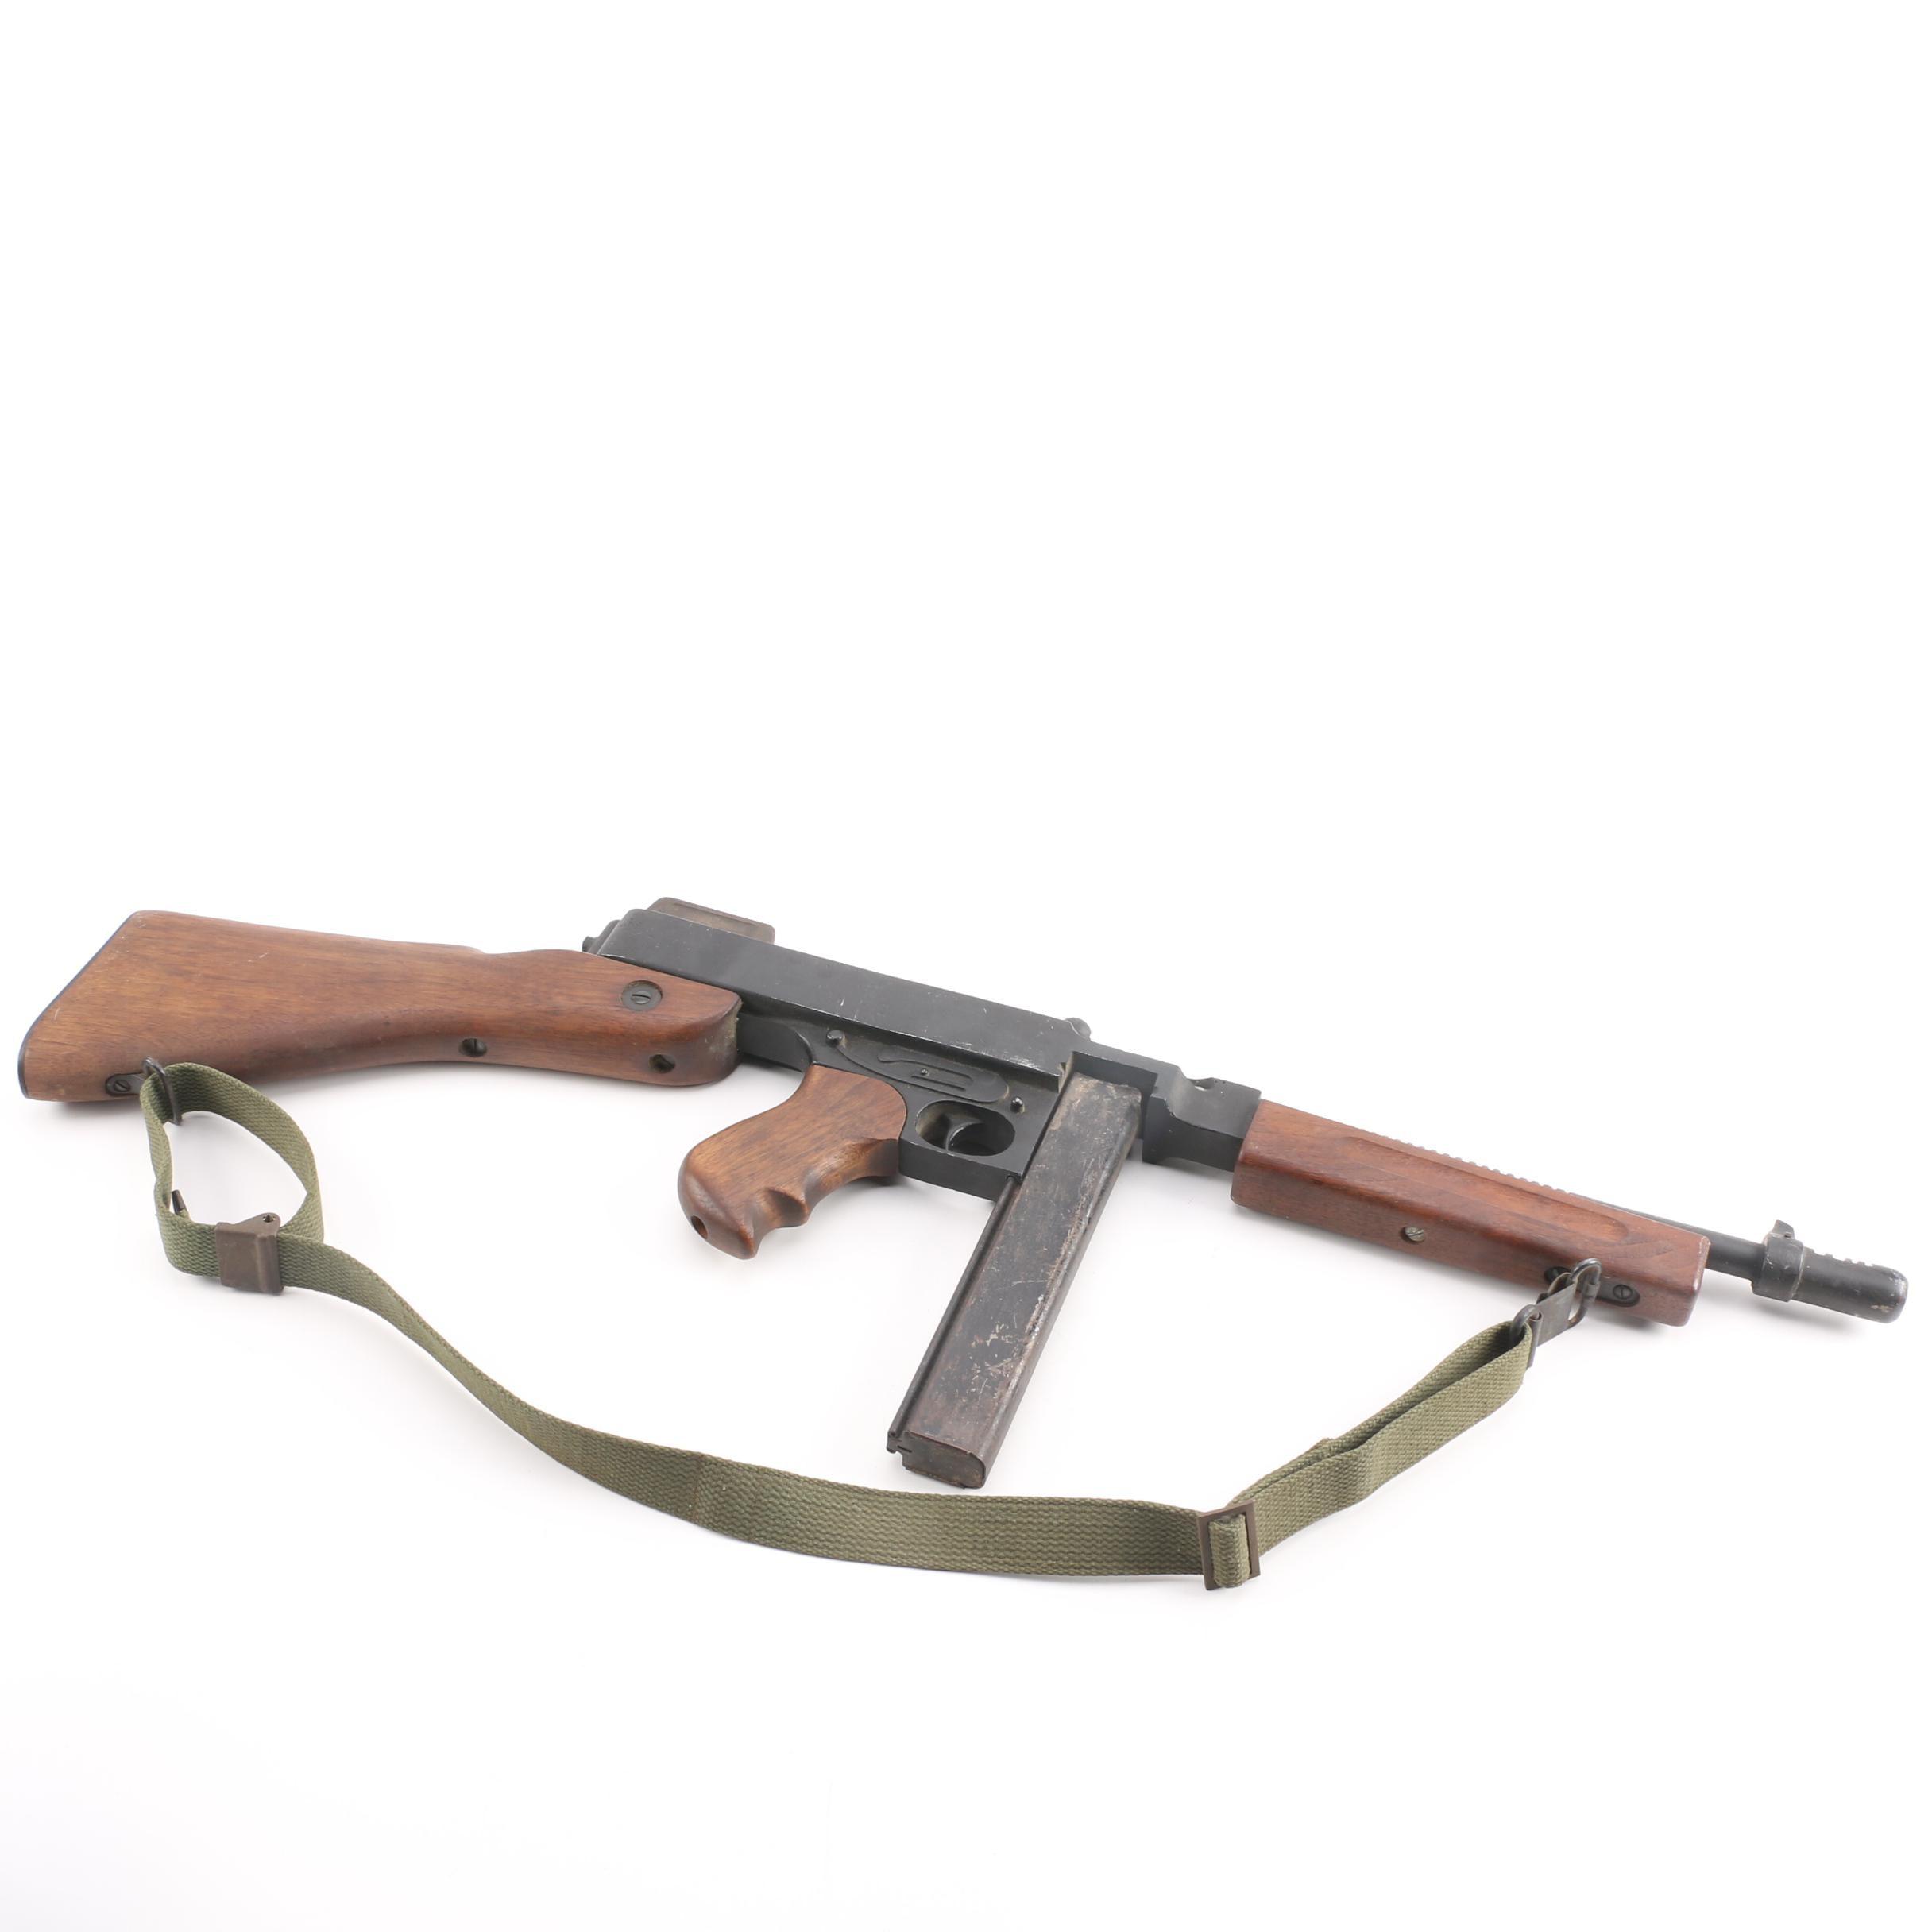 Non-Functioning Replica of a Prohibition Era Thompson Submachine Gun